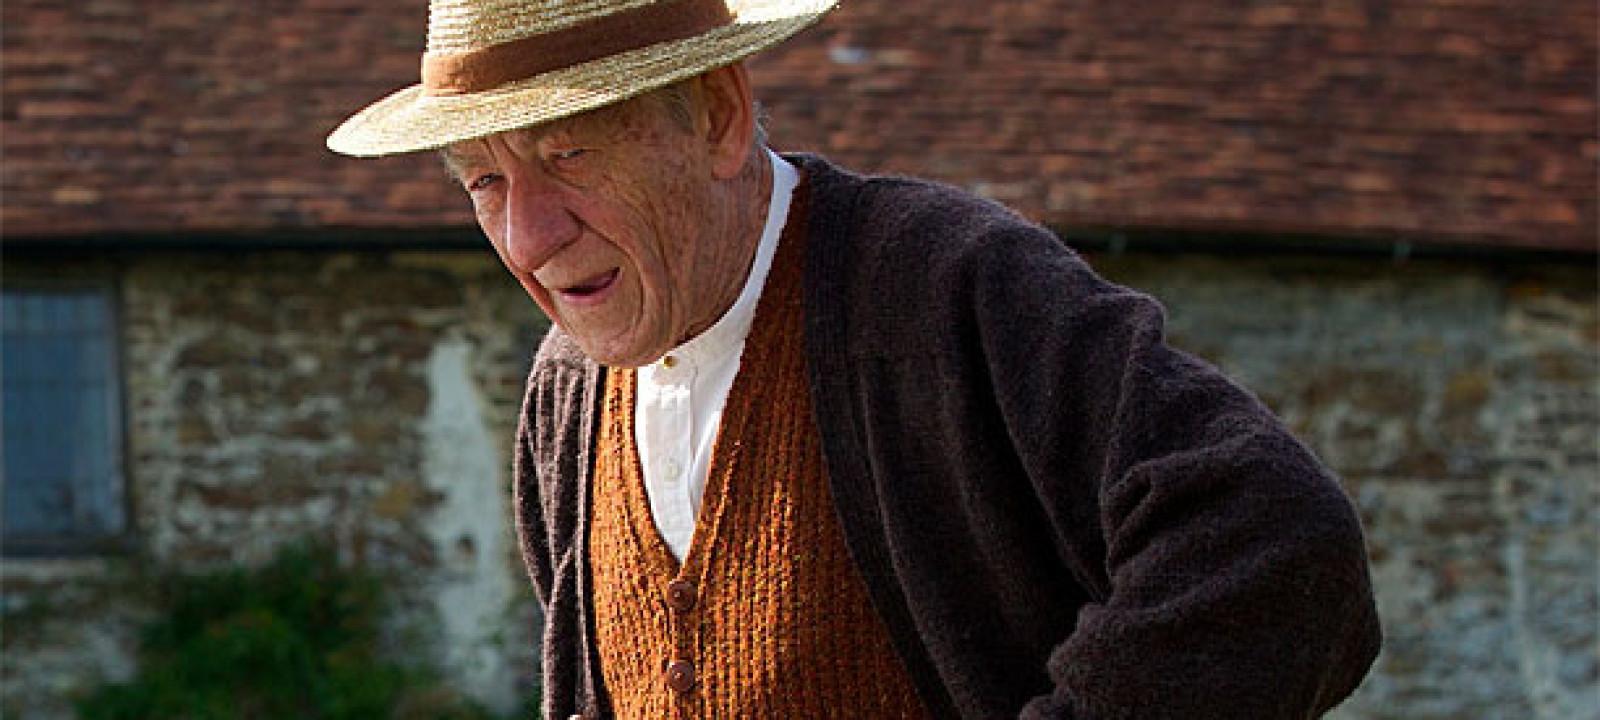 Sir Ian McKellen as Sherlock Holmes in 'Mr Holmes'